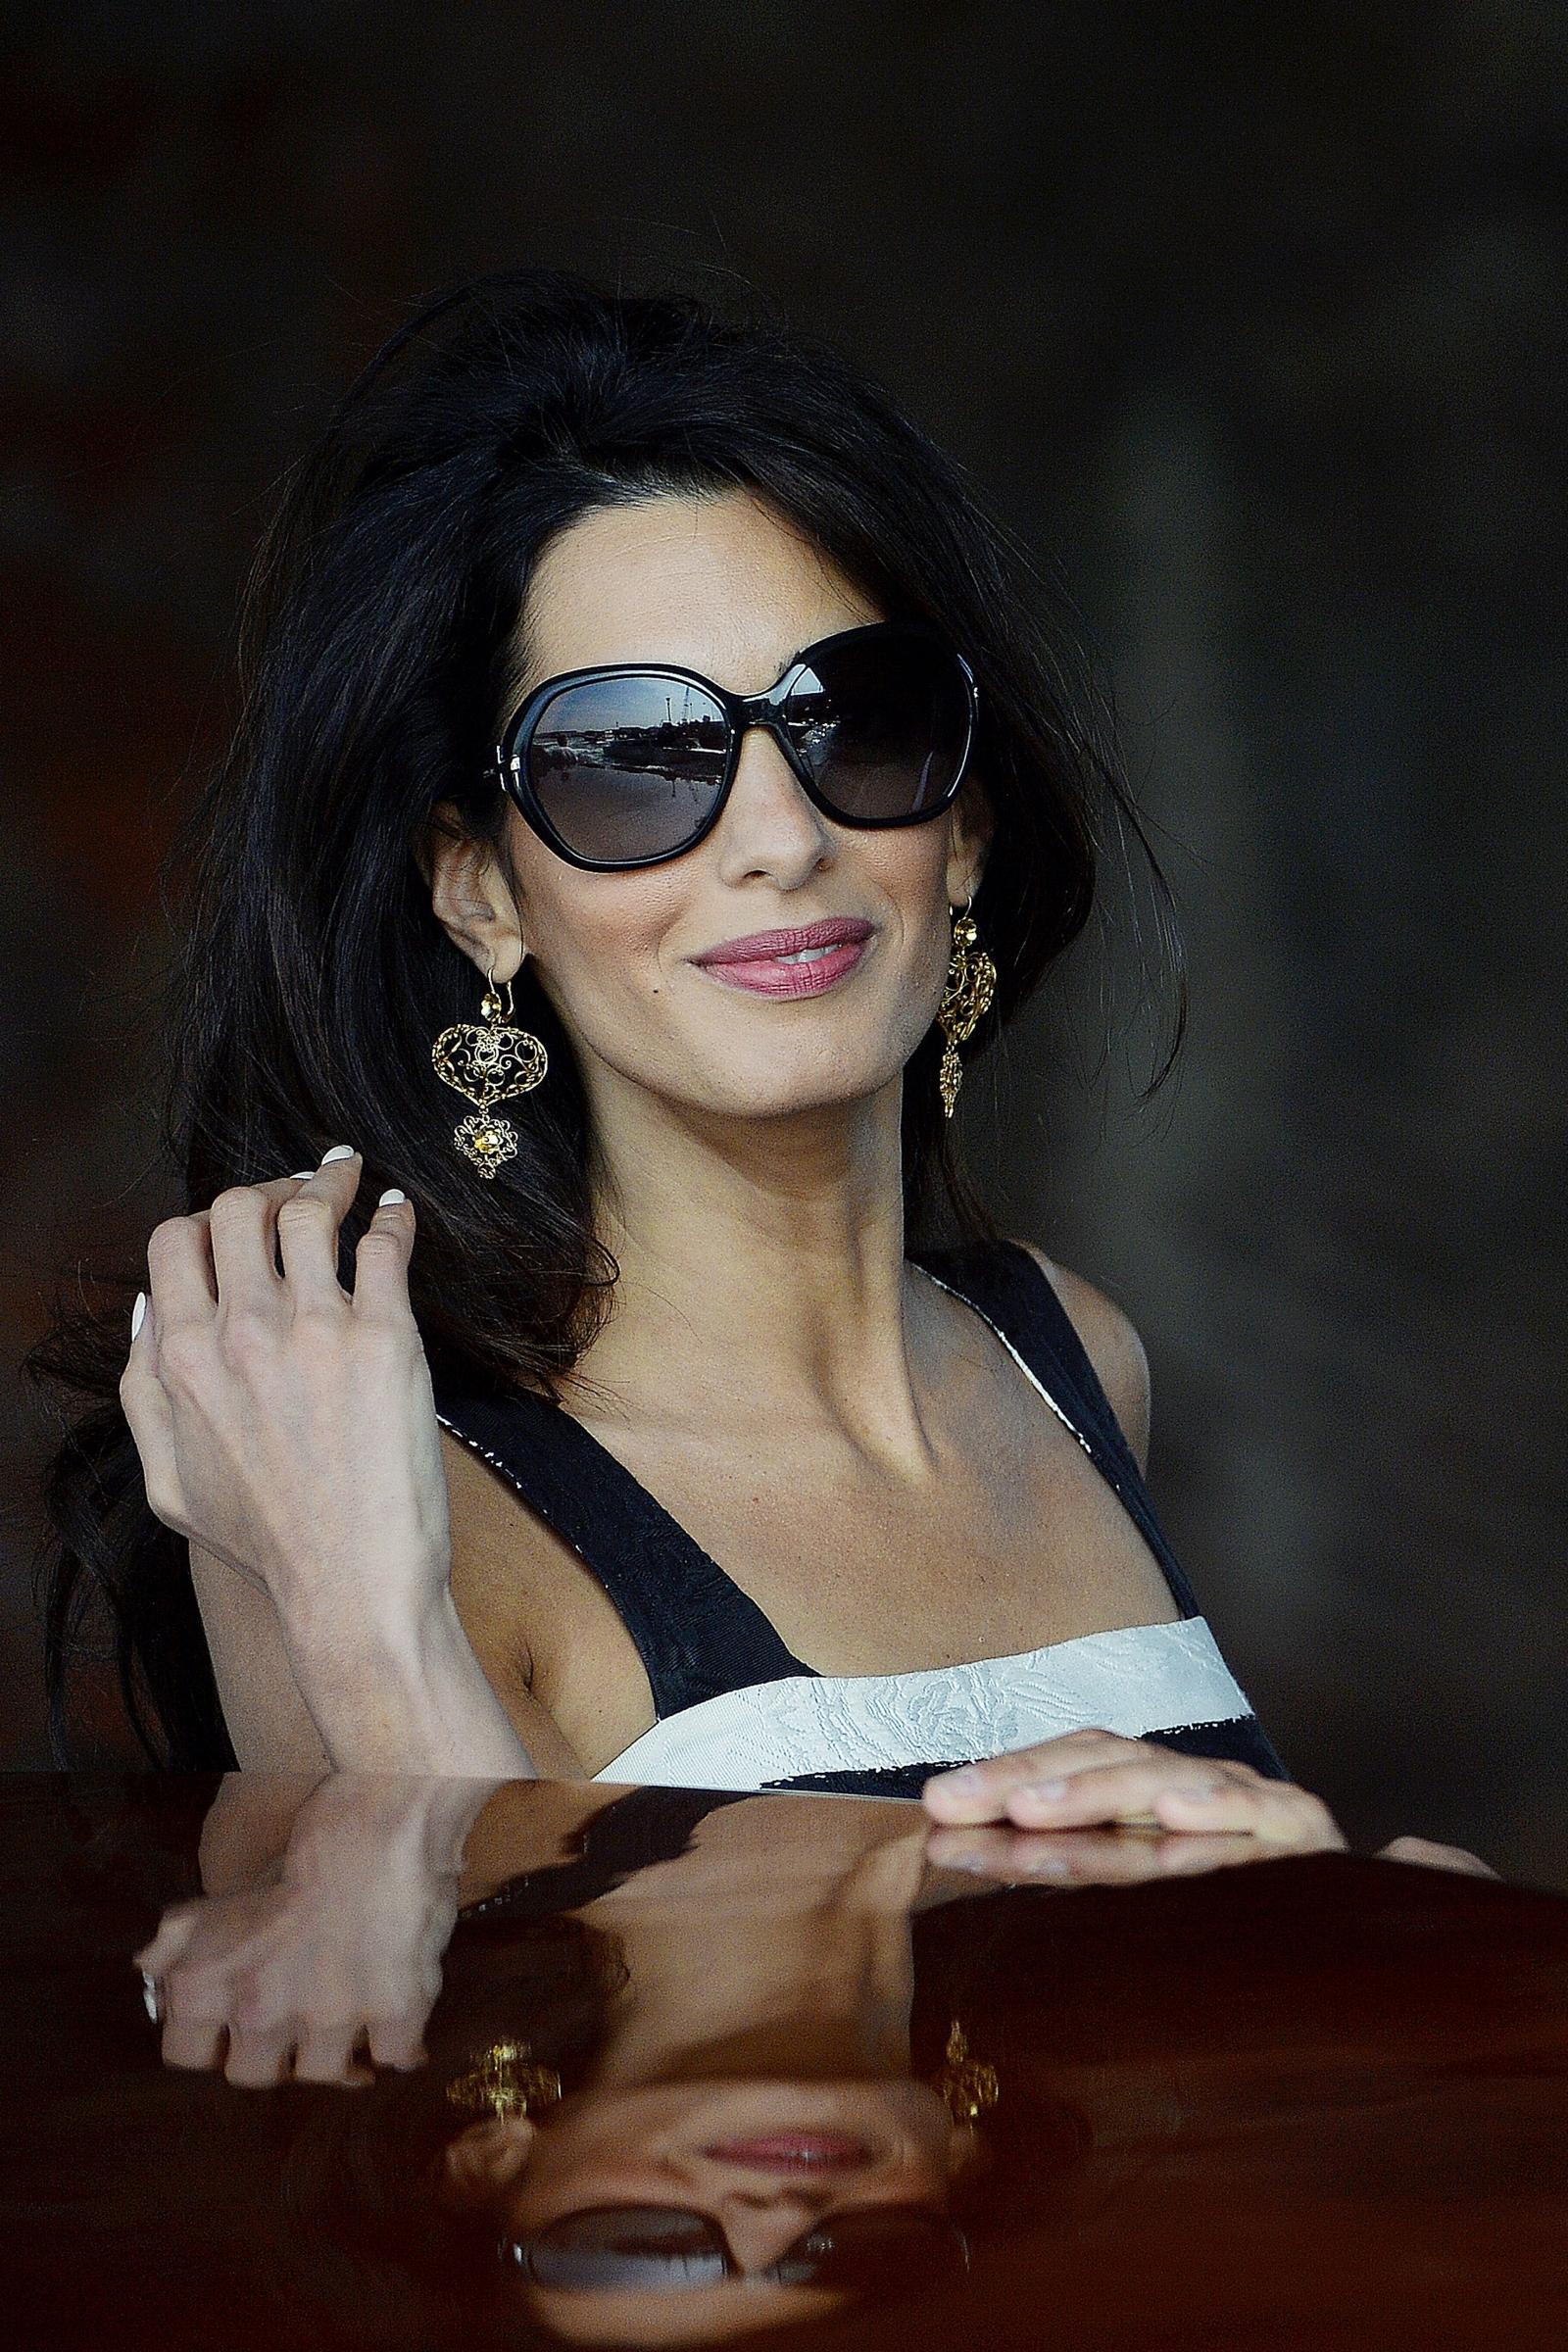 George Clooney's Lebanon-born British fiancee Amal Alamuddin arrives in Venice